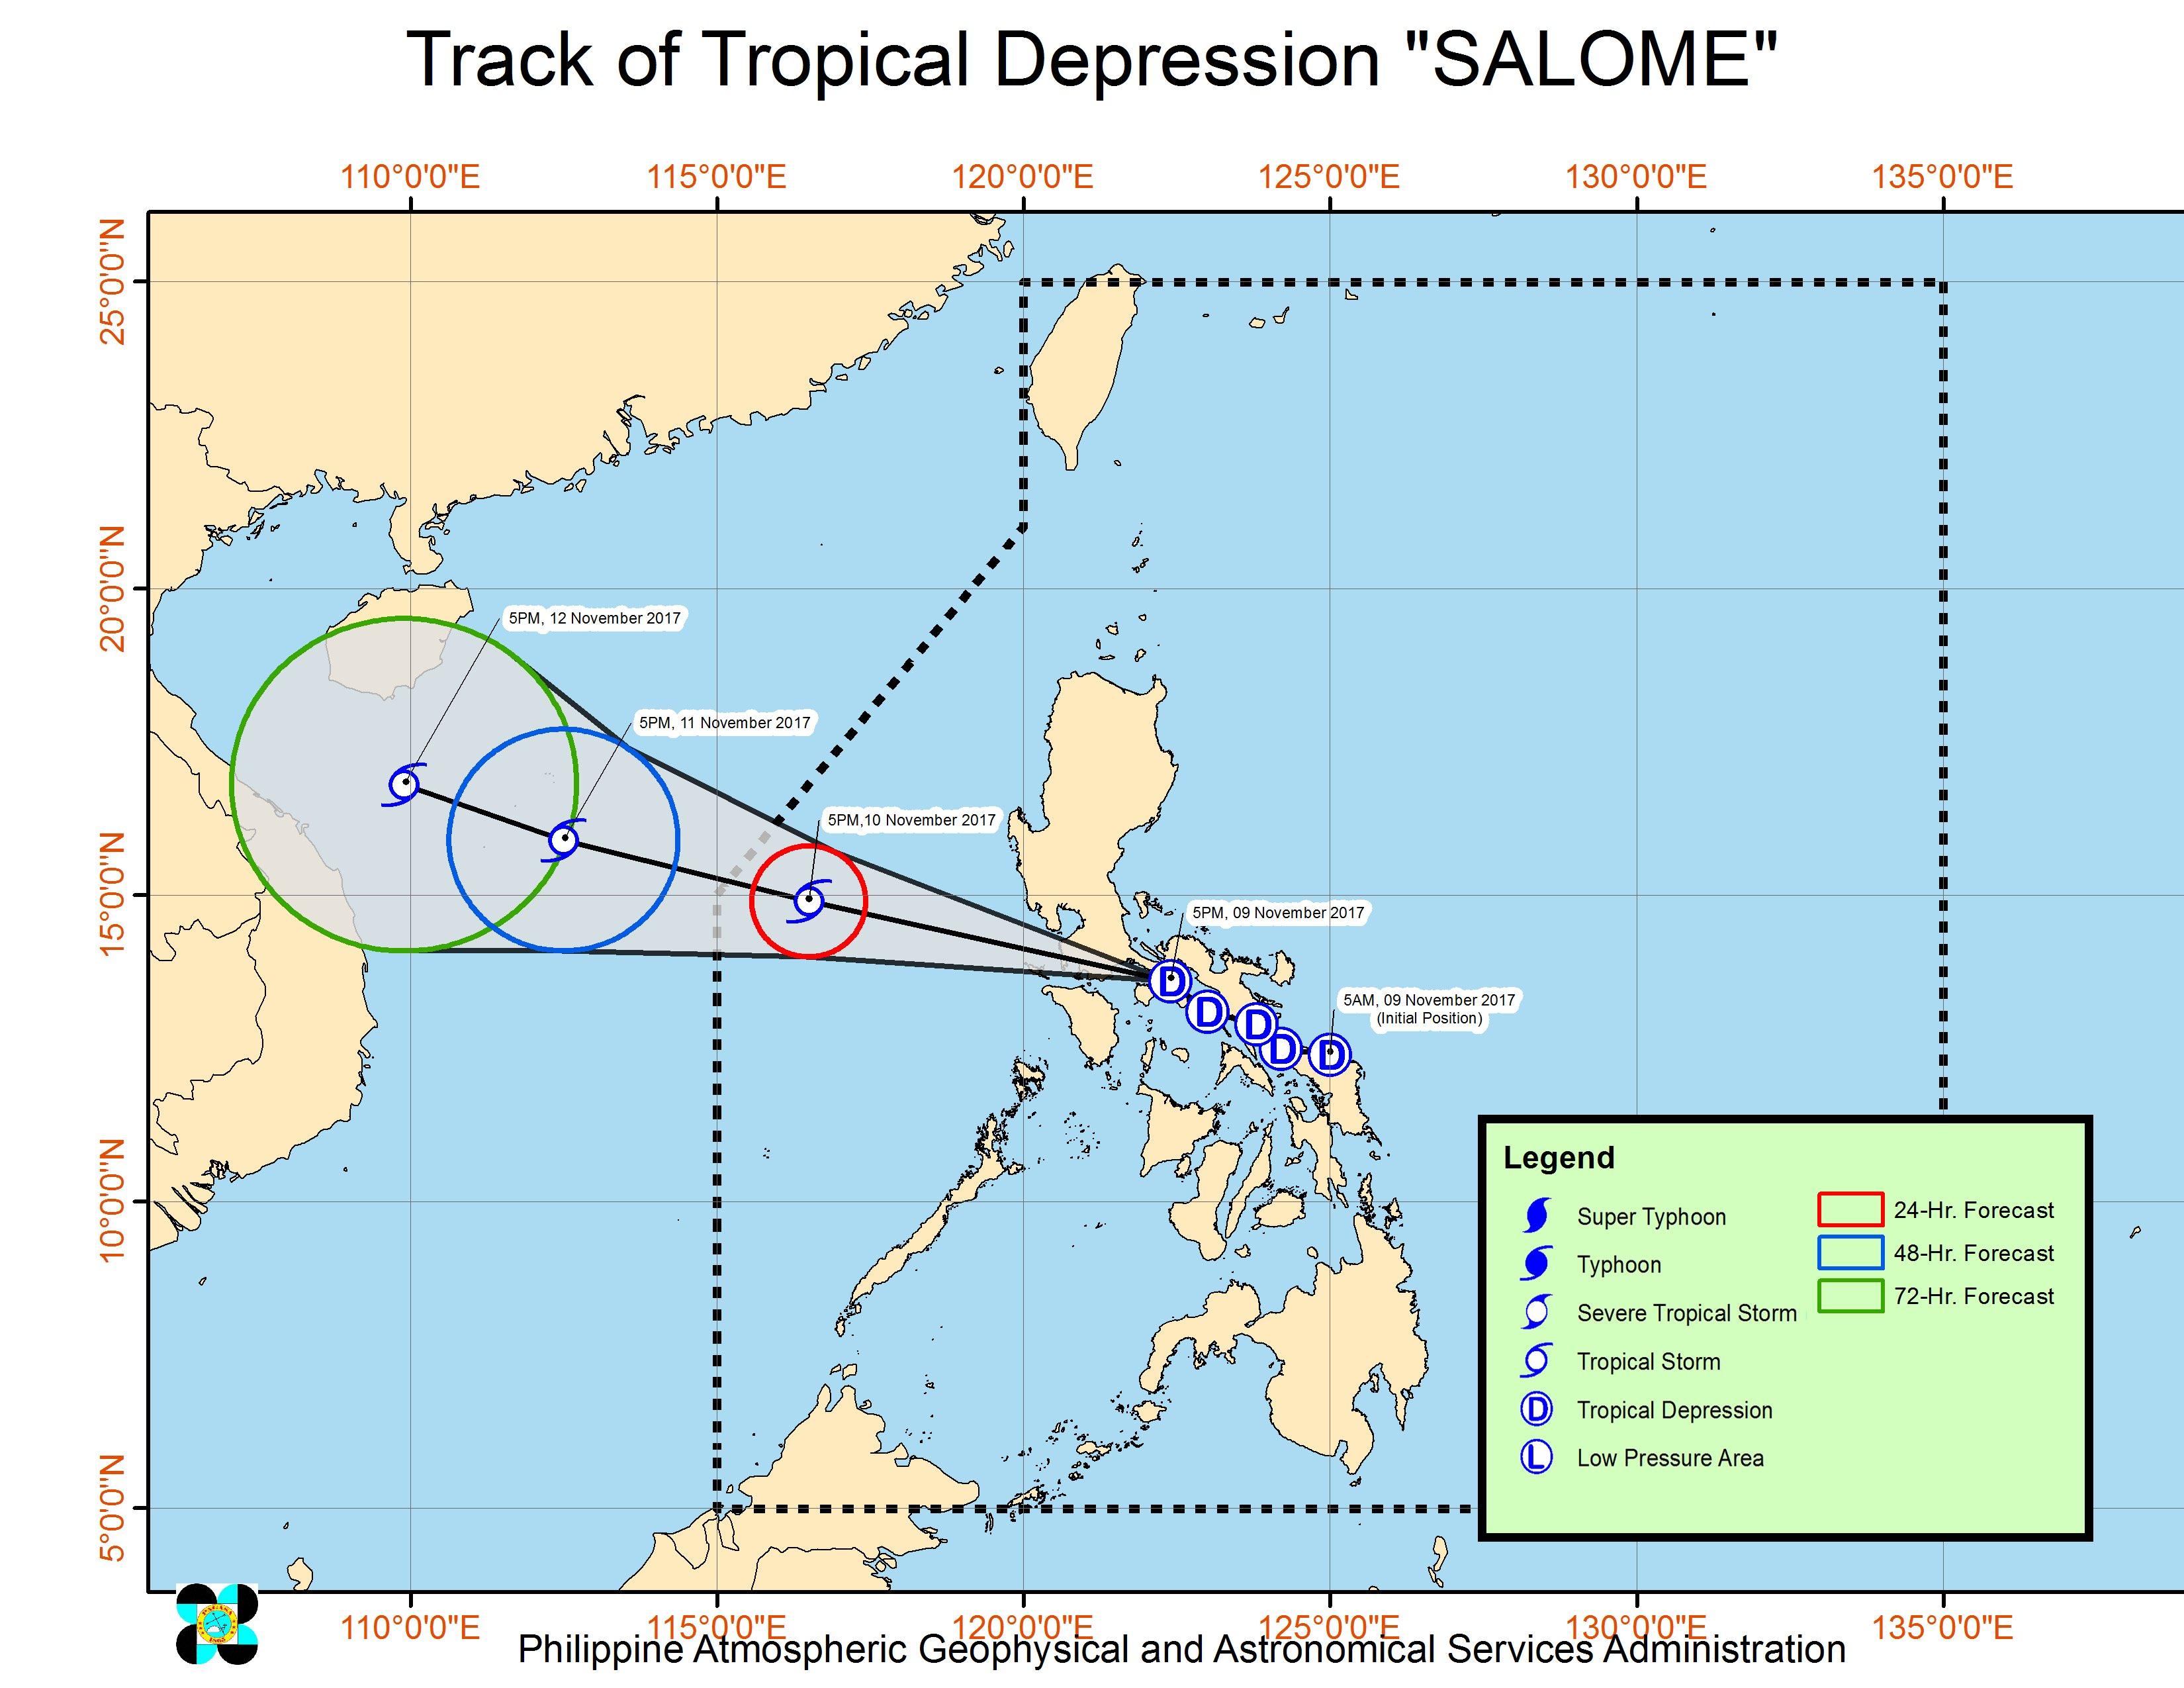 Forecast track of Tropical Depression Salome as of November 9, 8 pm. Image courtesy of PAGASA